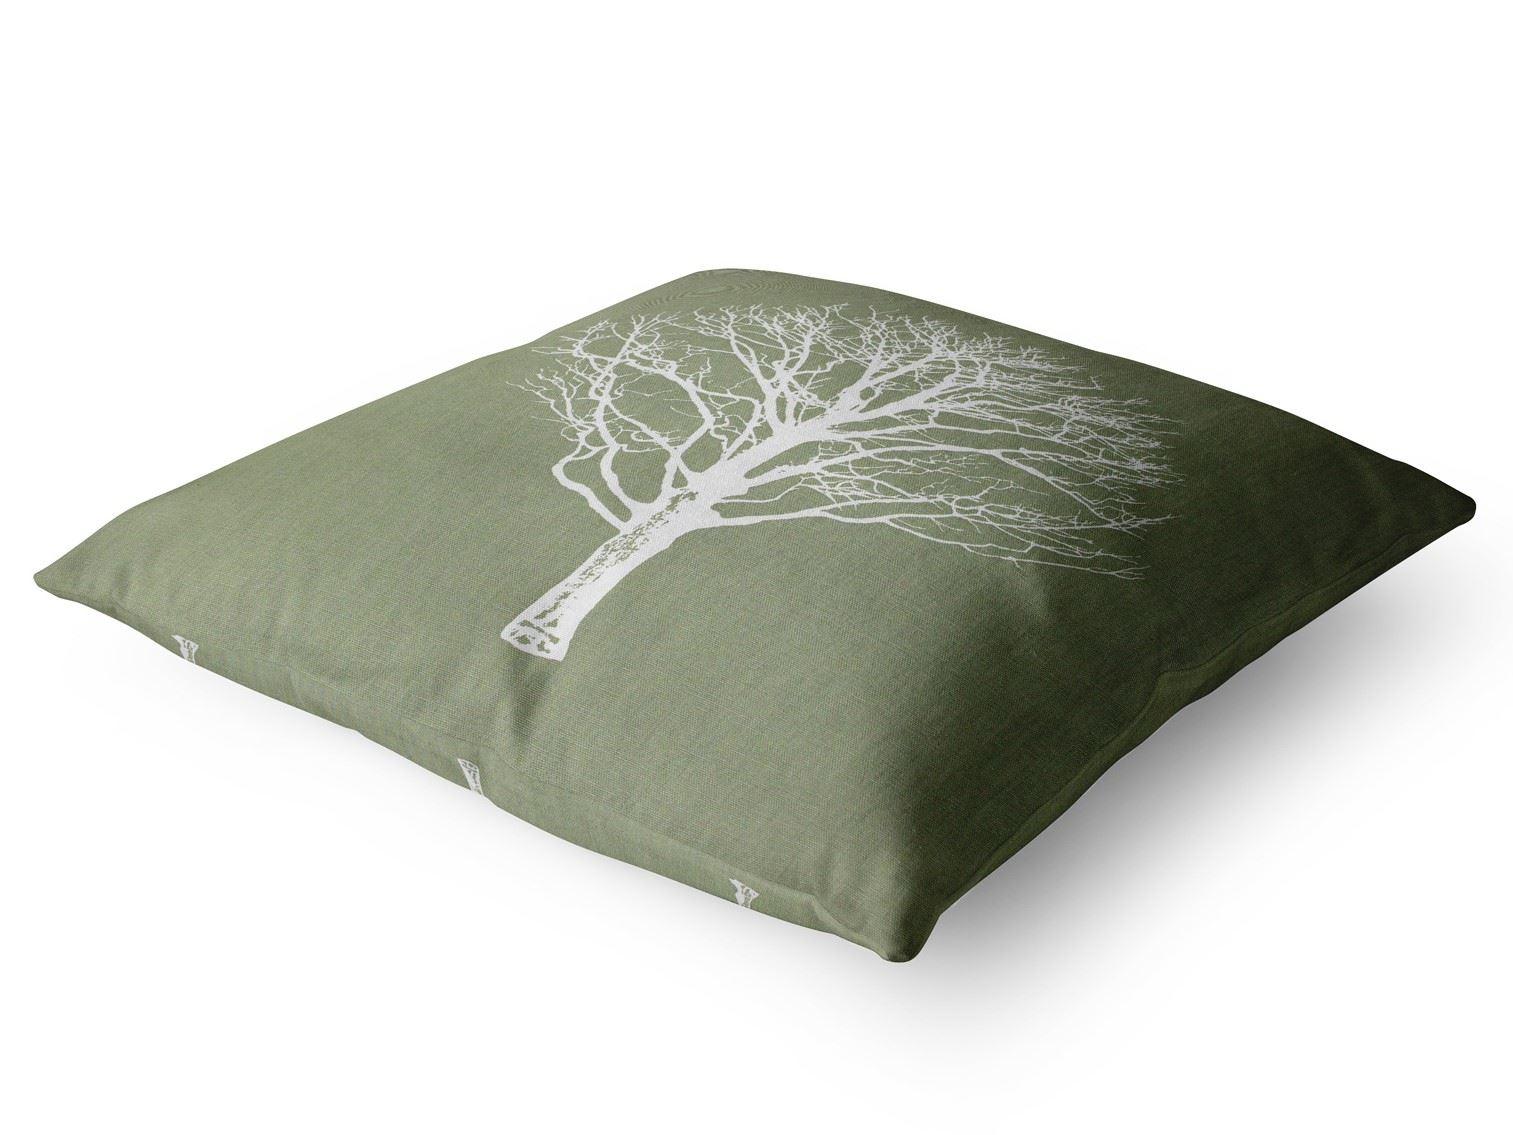 Woodland-Trees-Cushion-Cover-Modern-Reversible-Tree-Print-Covers-17-034-x-17-034 thumbnail 25